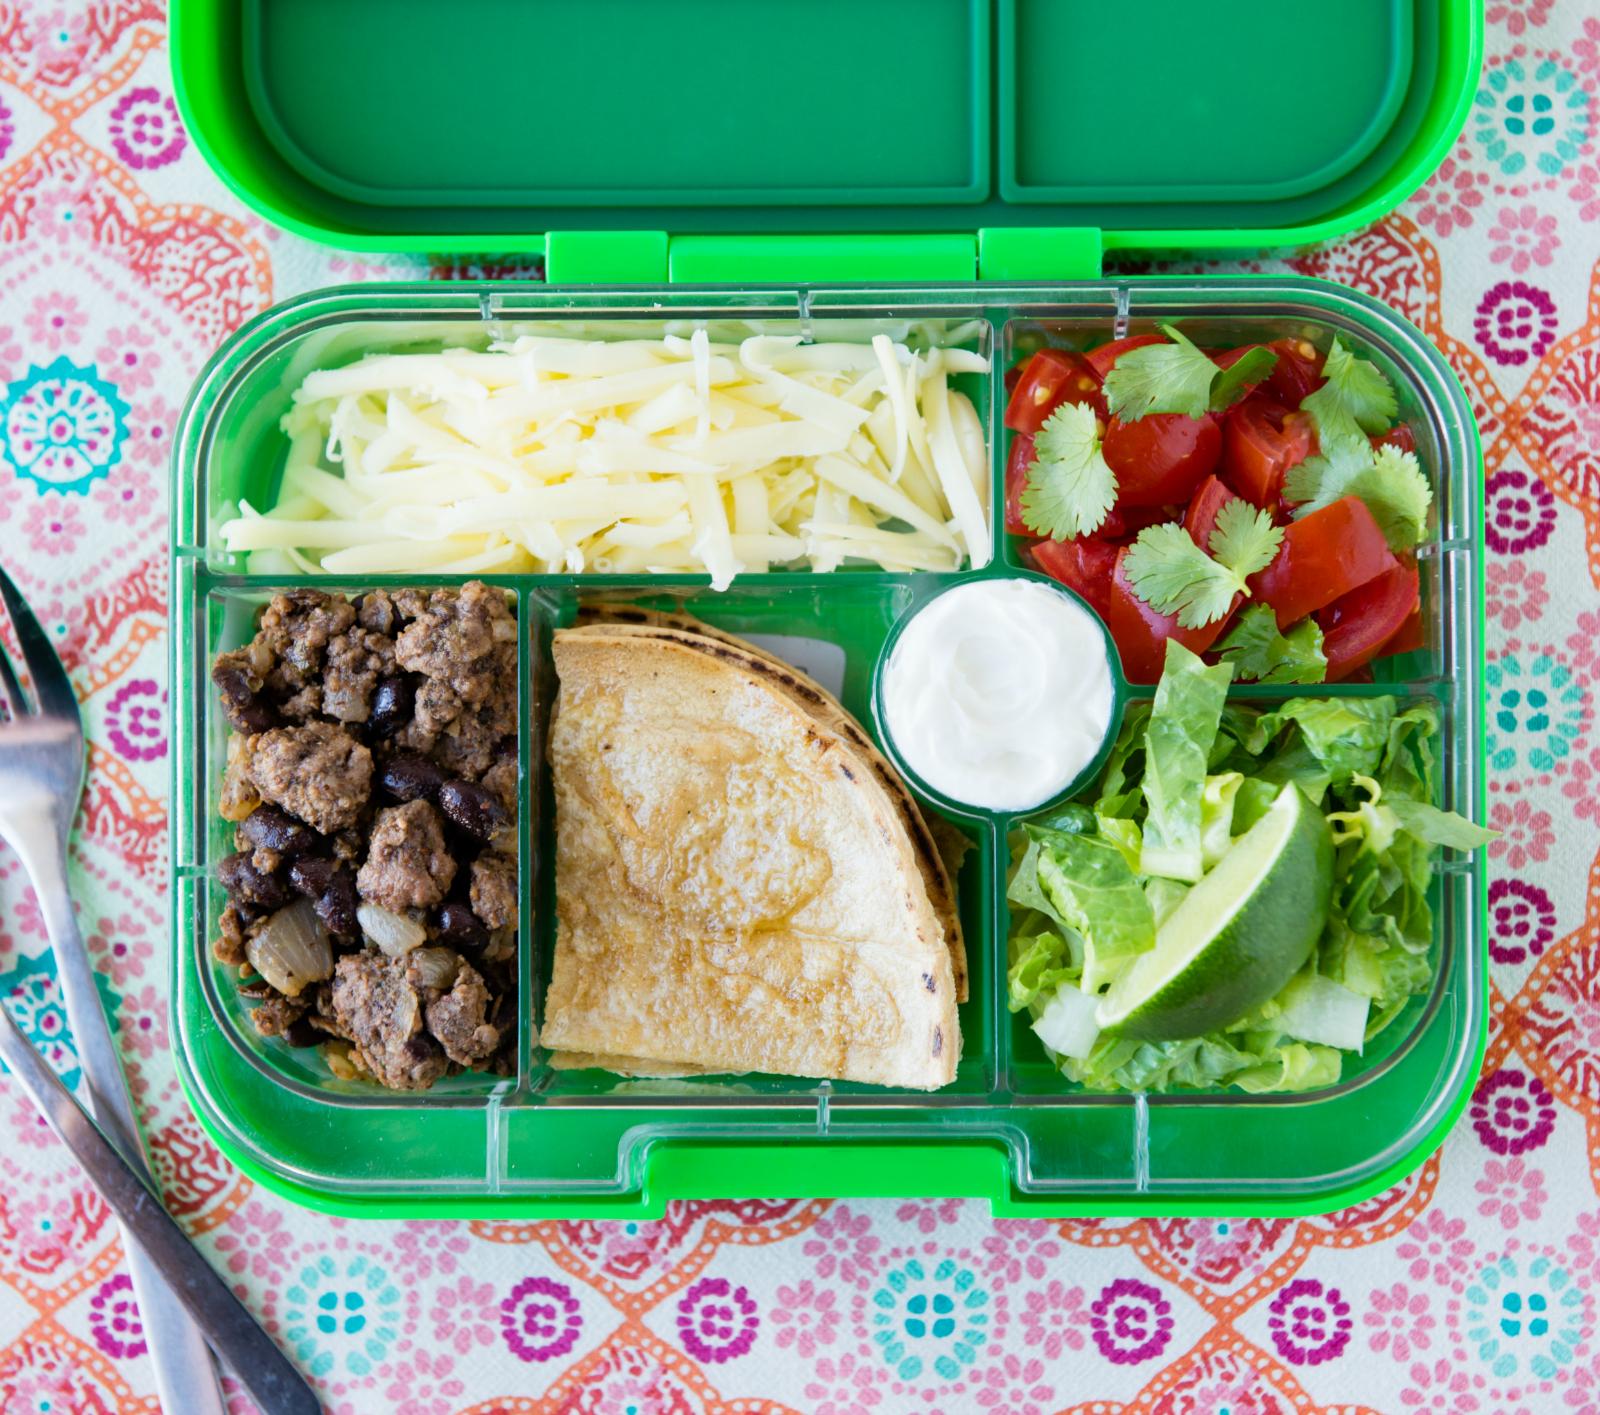 Leftover taco salad in lunchbox